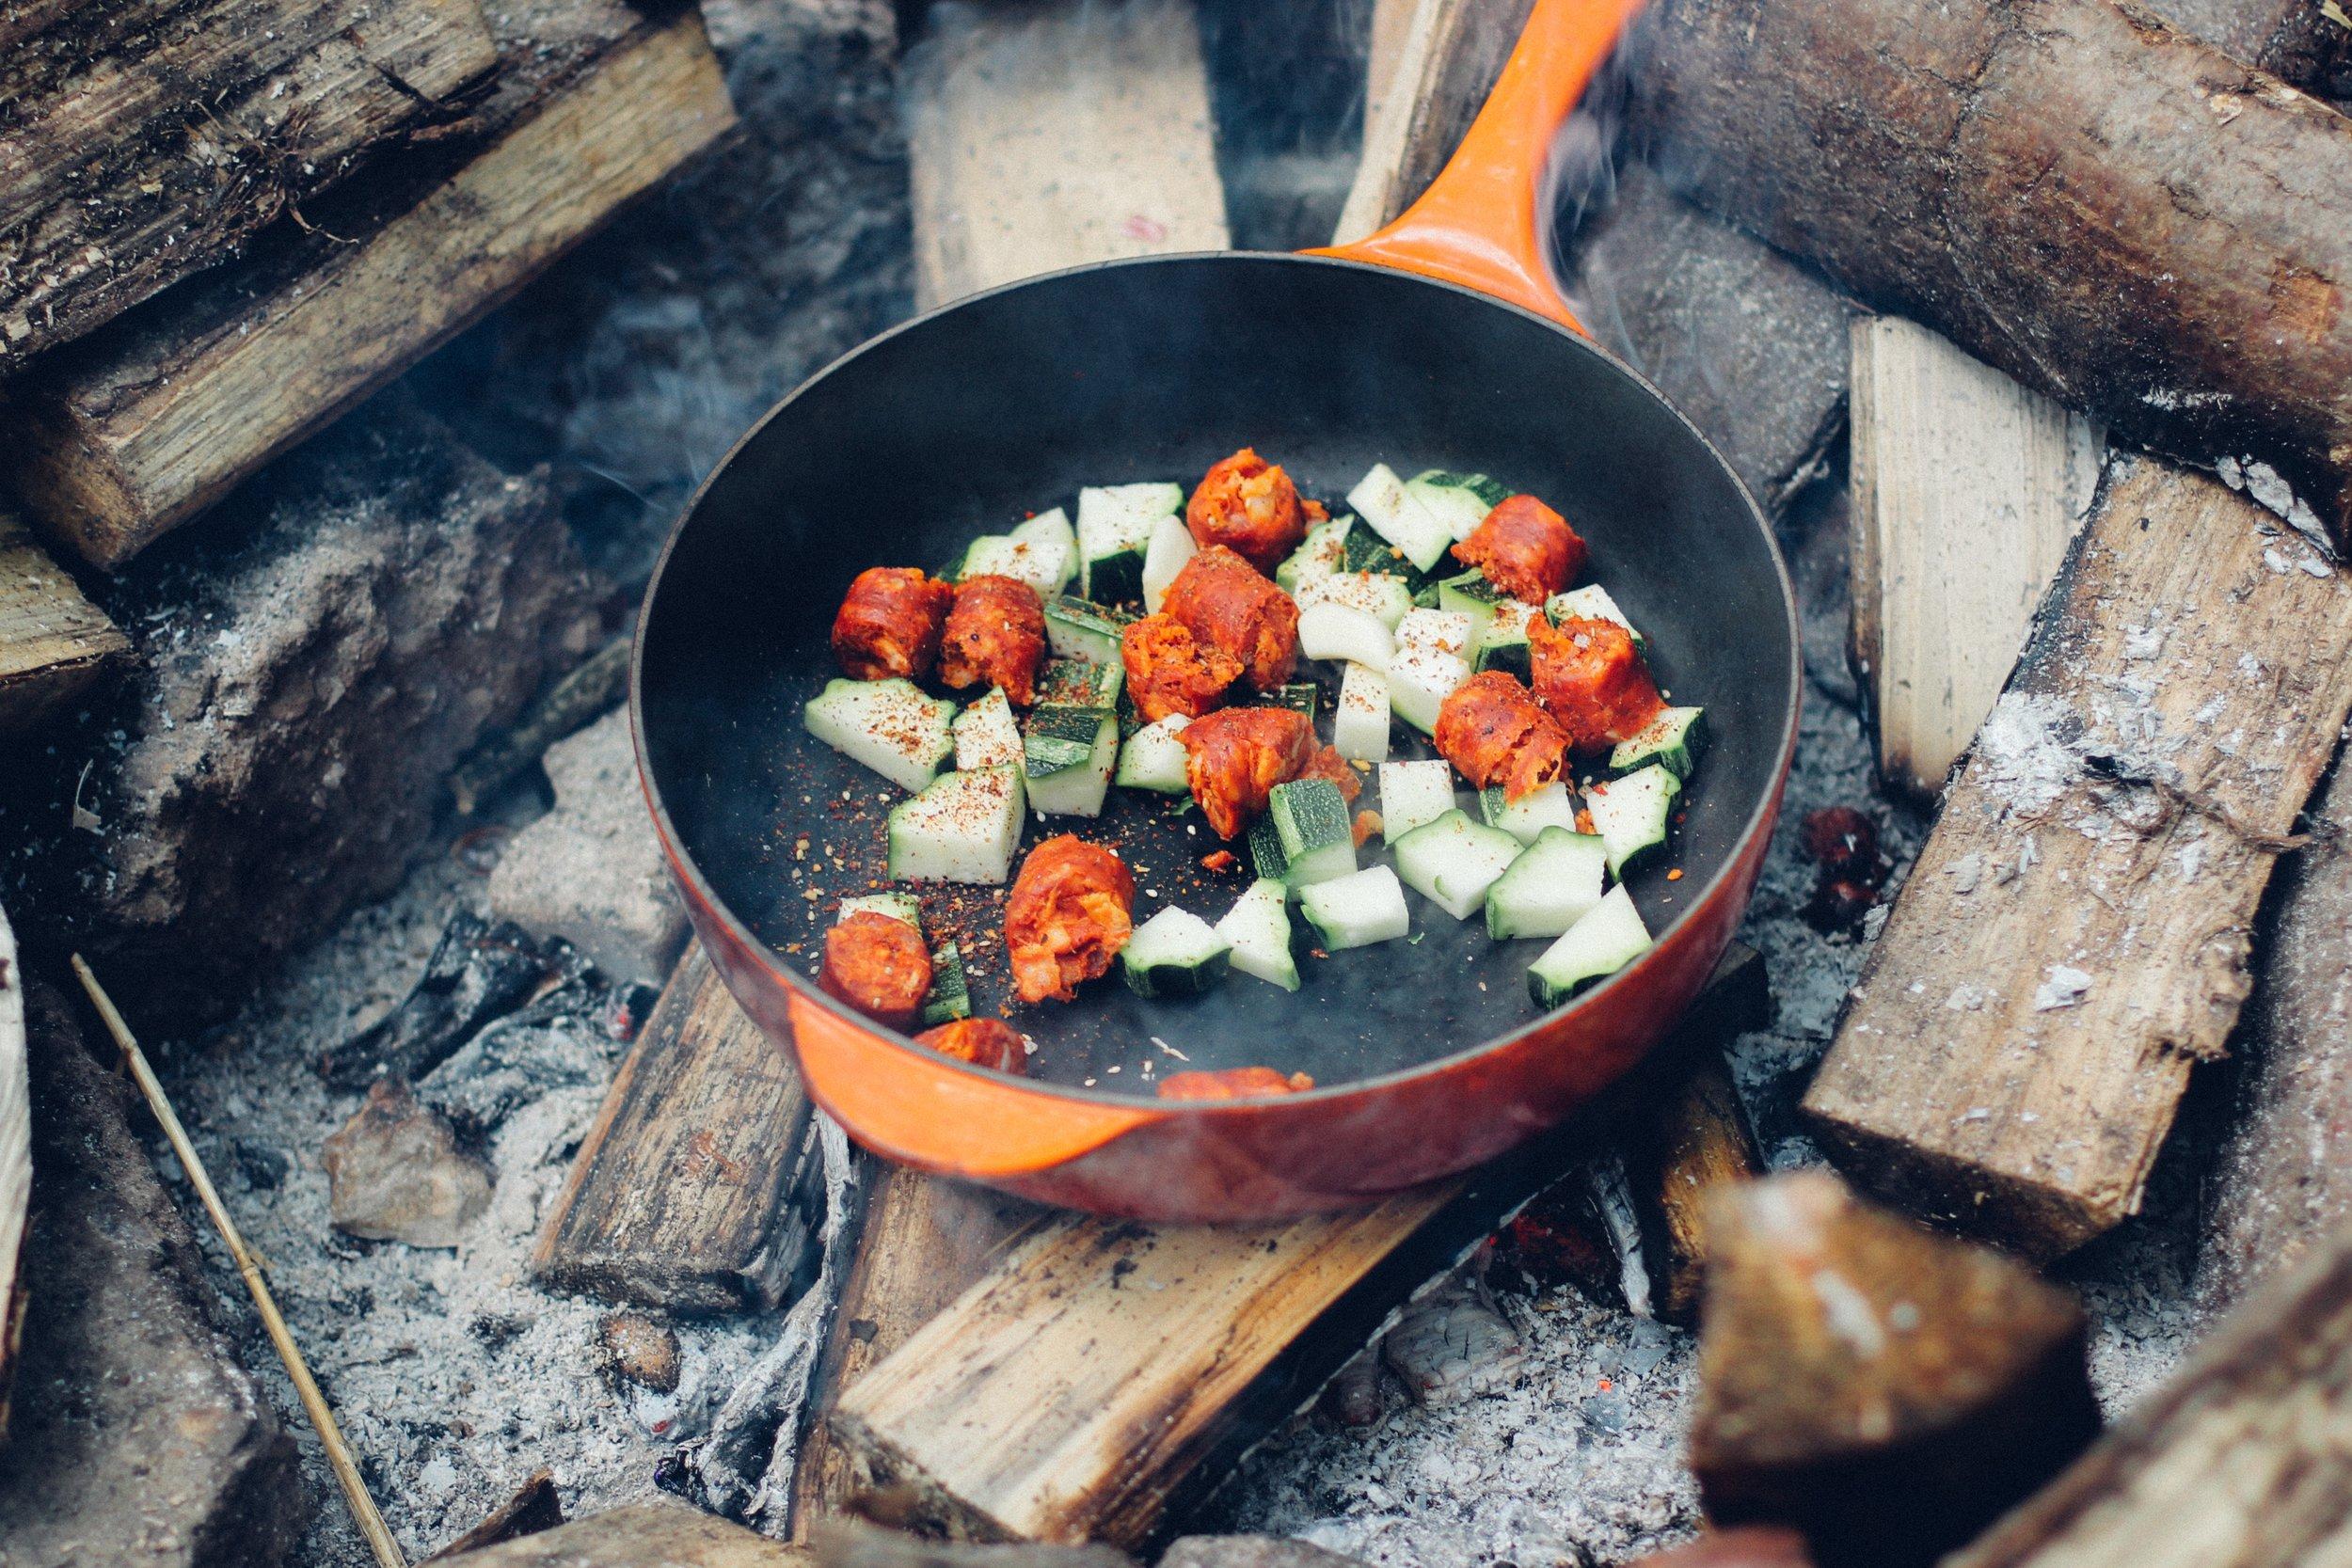 gourmet camping recipes, paella recipe, camping paella recipe, easy camping meals for family, make ahead camping meals, easy camping meals for large groups, camping menu ideas, easy camping lunches, campfire foil recipes, camp stove recipes